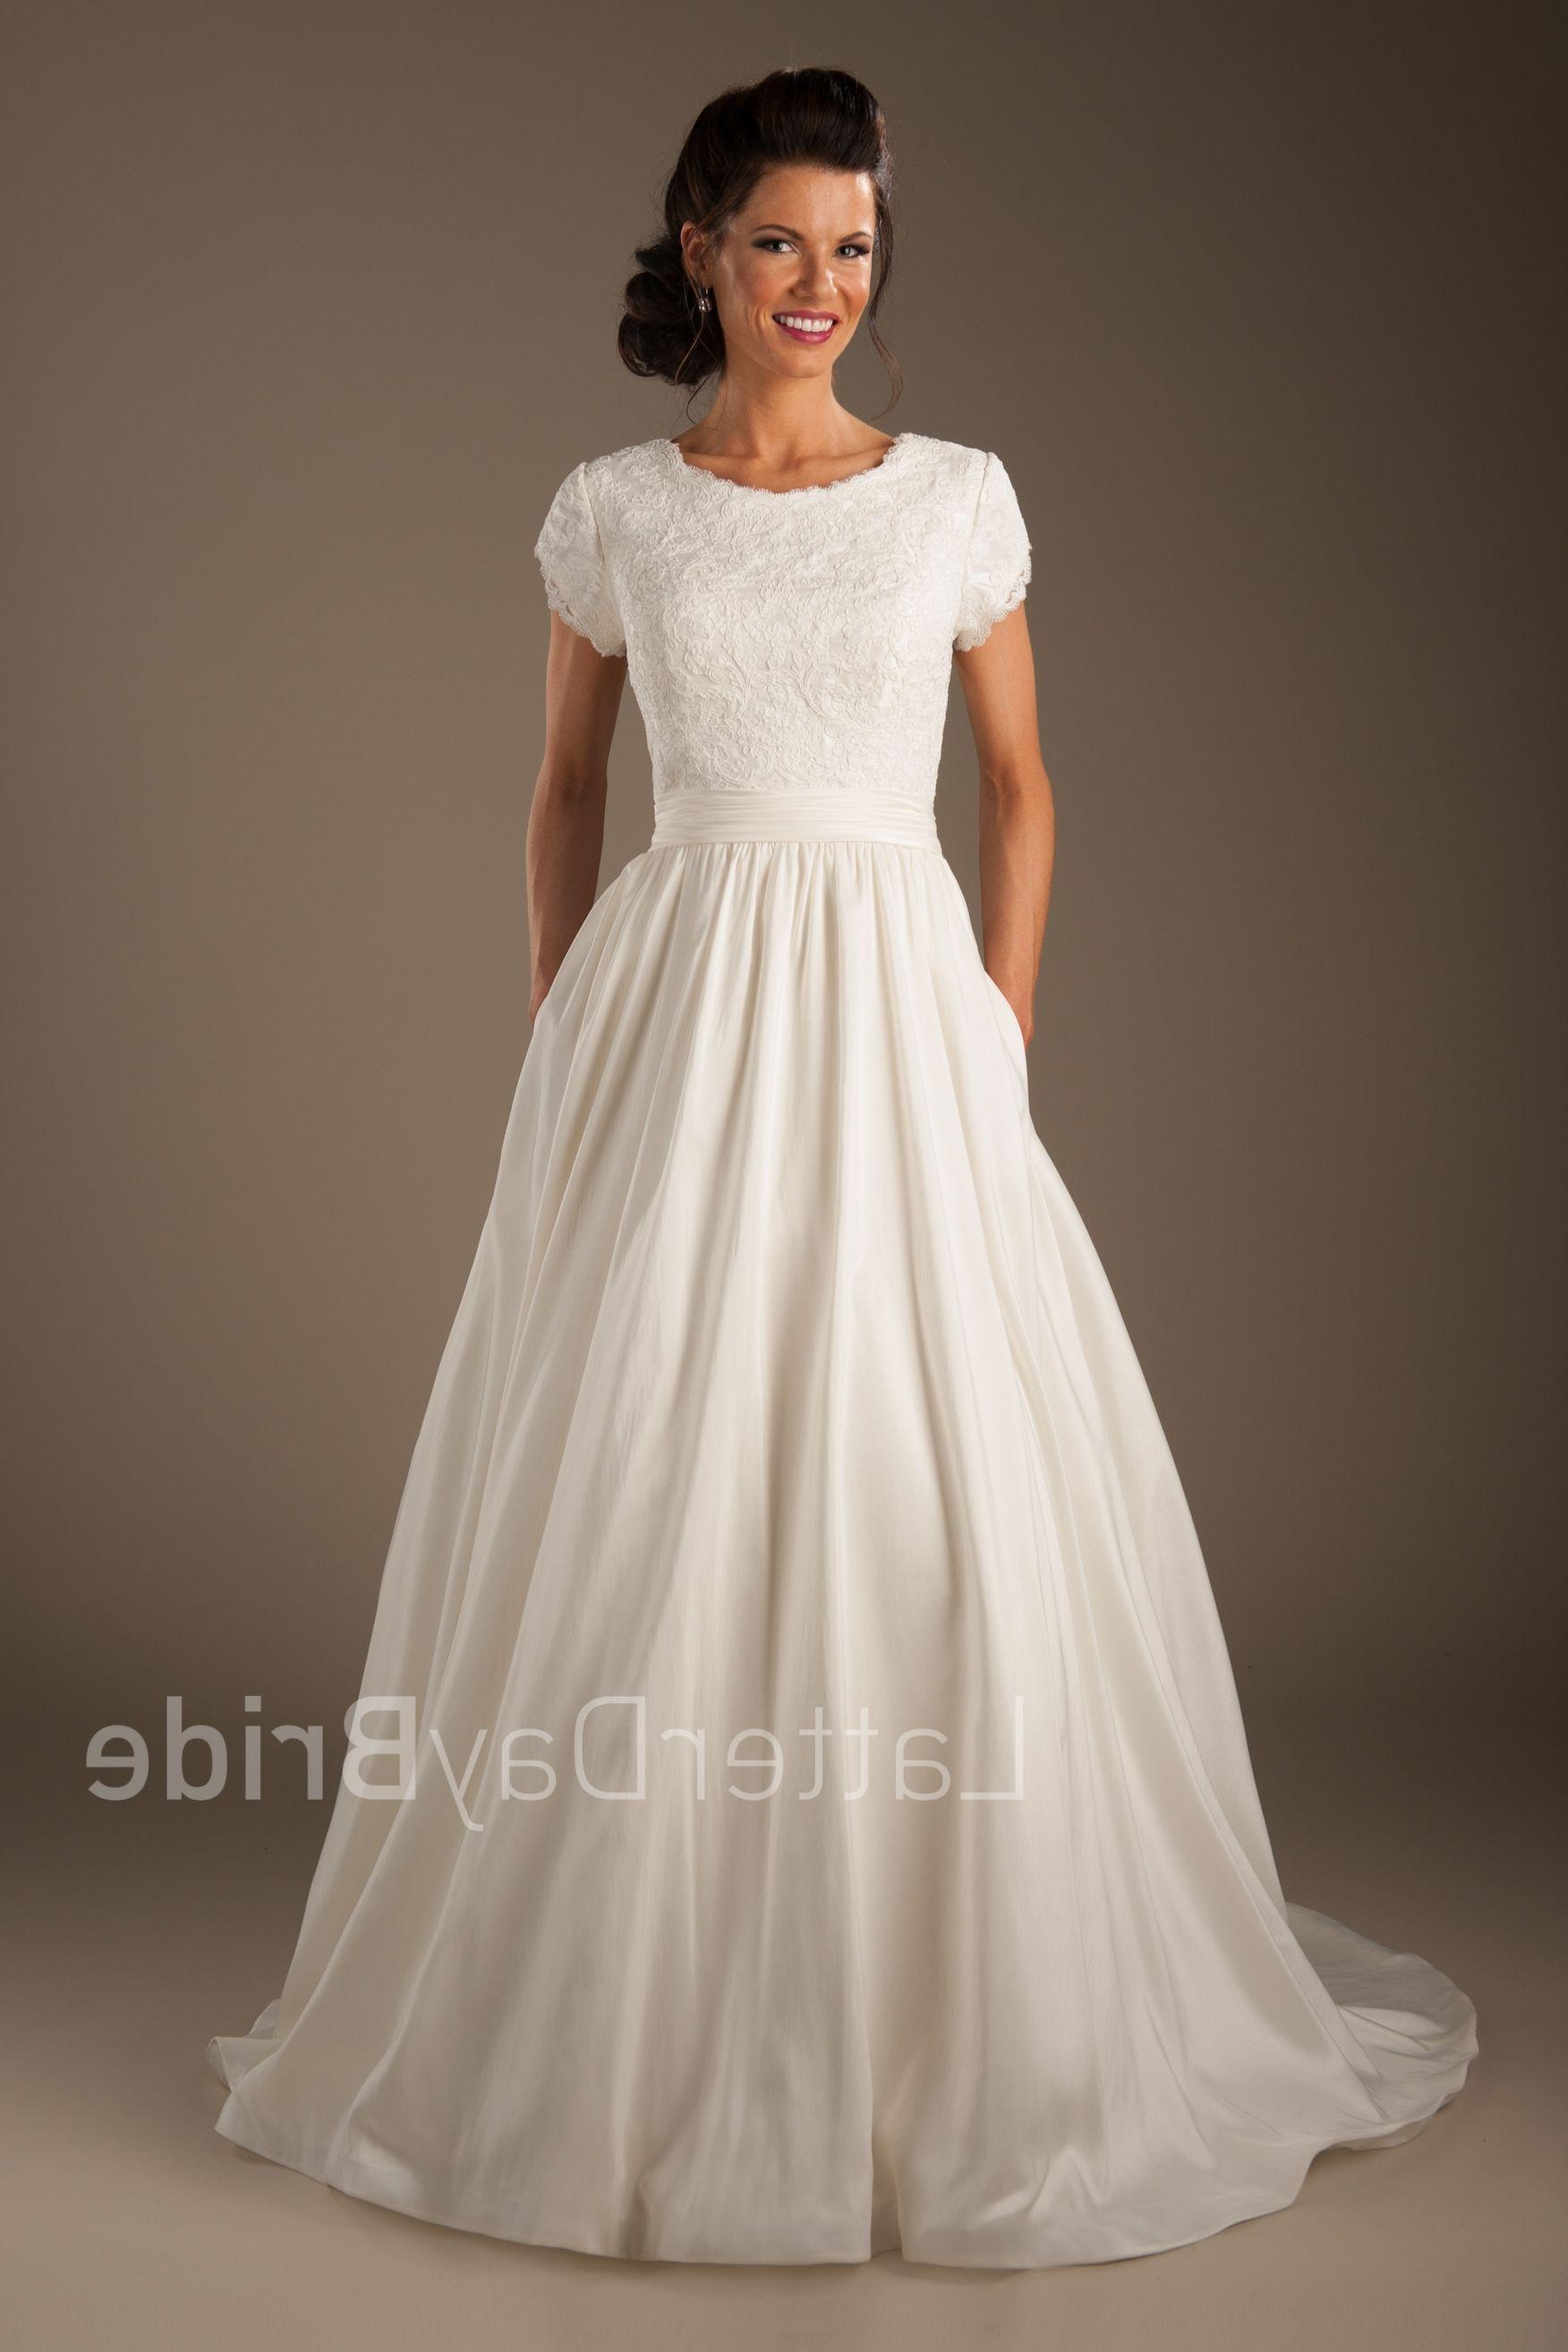 Reasonably priced wedding dresses brisbane wedding dress reasonably priced wedding dresses brisbane ombrellifo Images